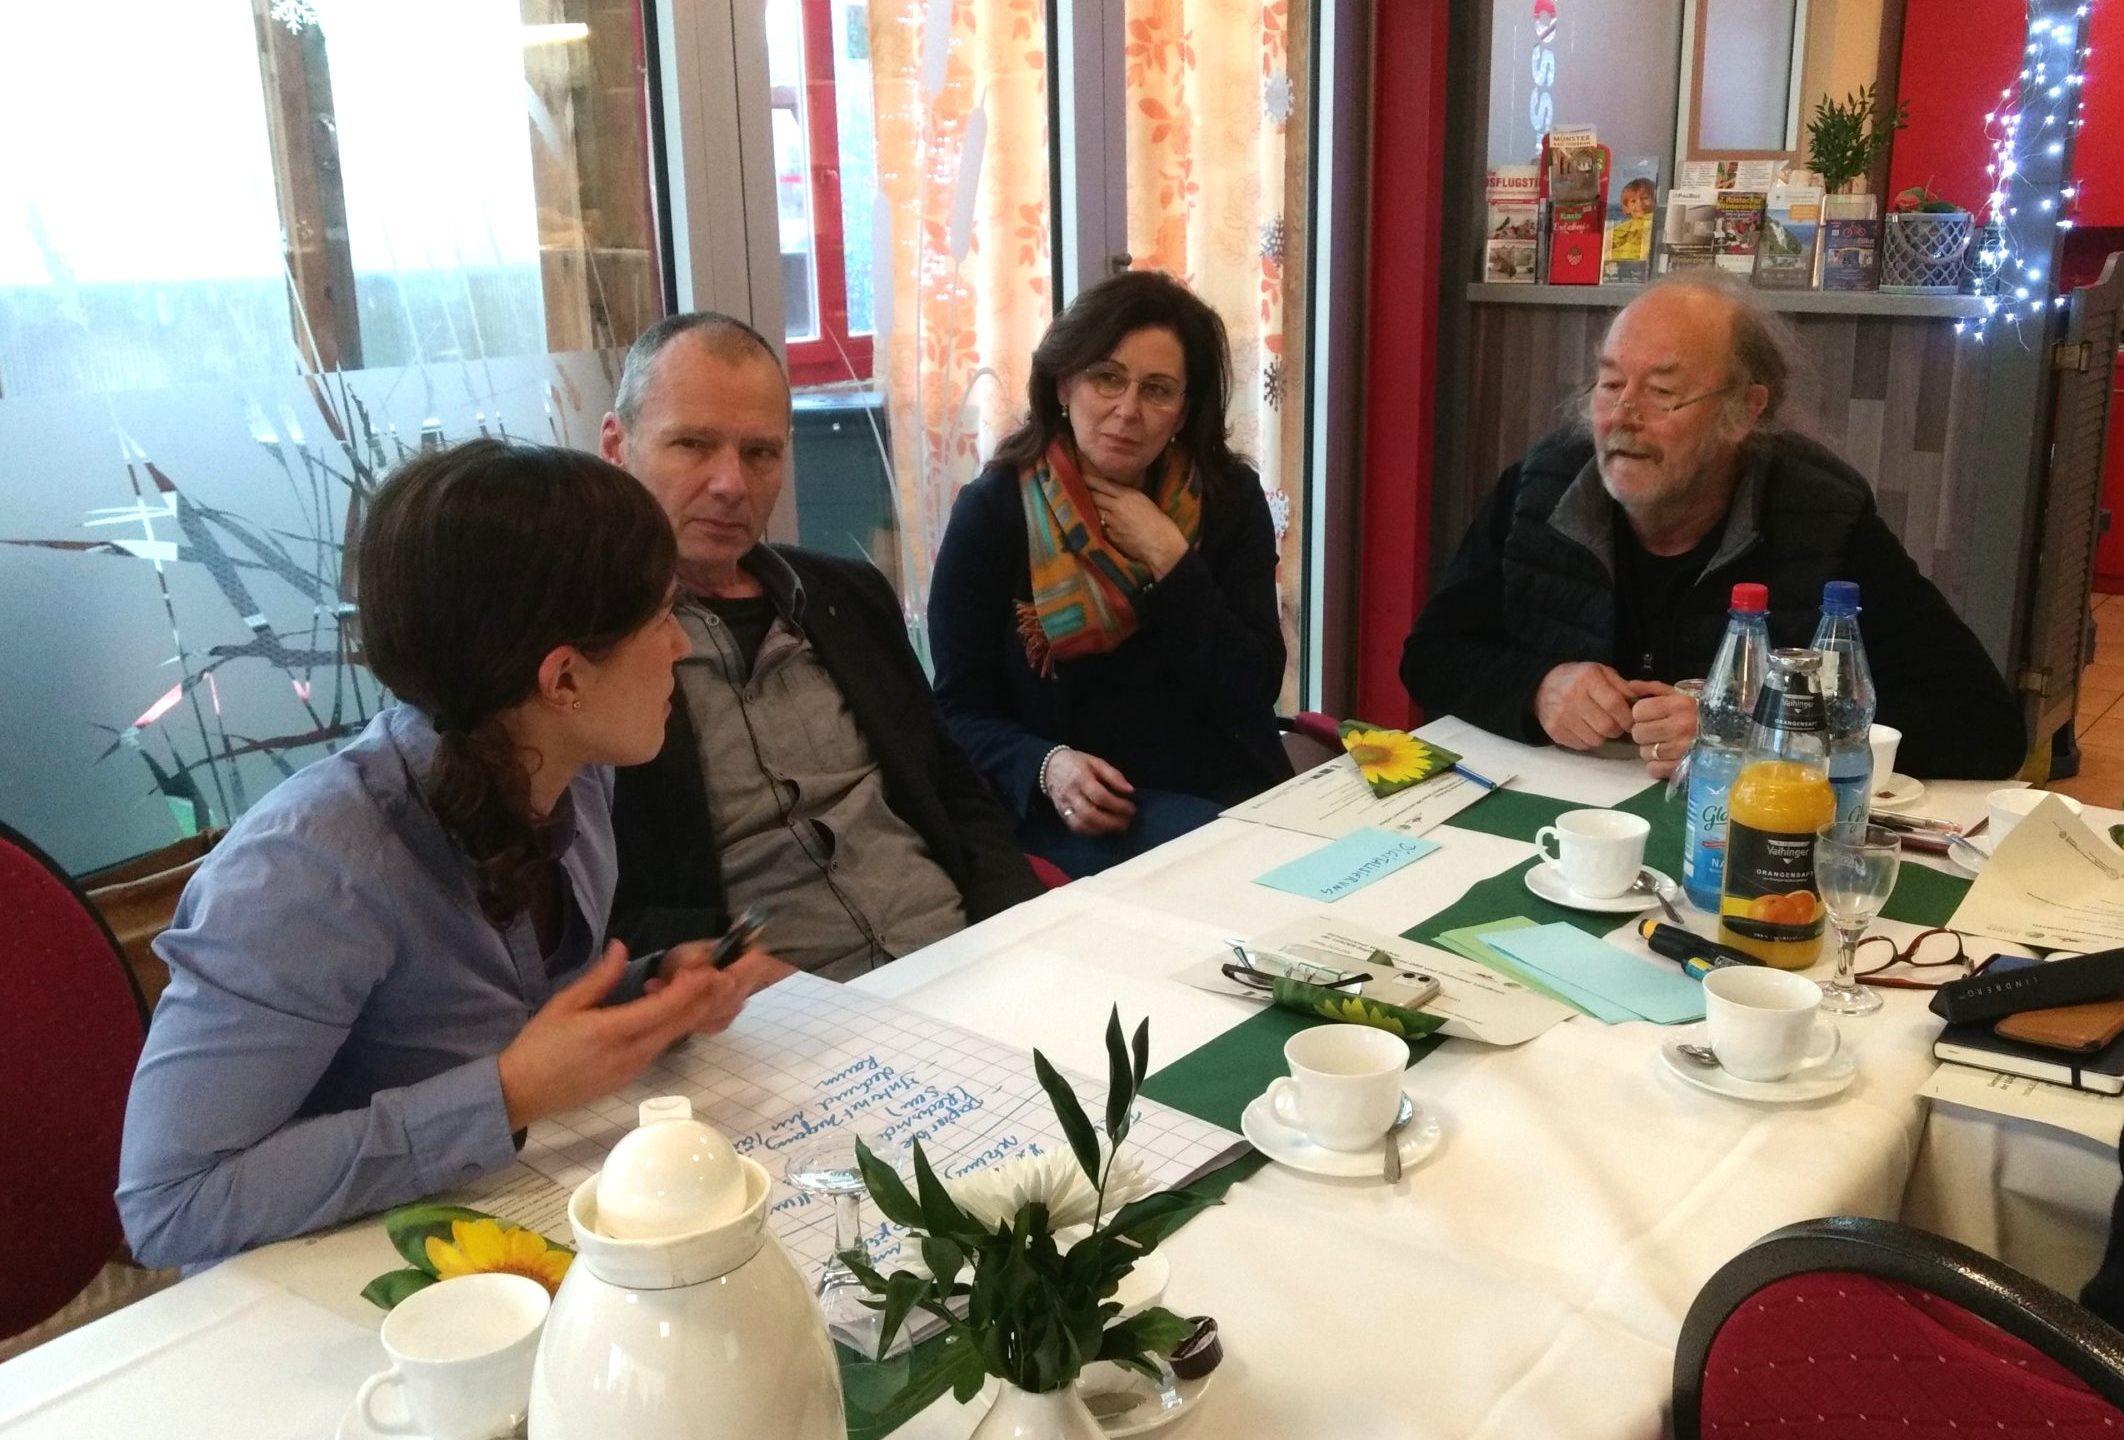 Diskussion in der Kleingruppe